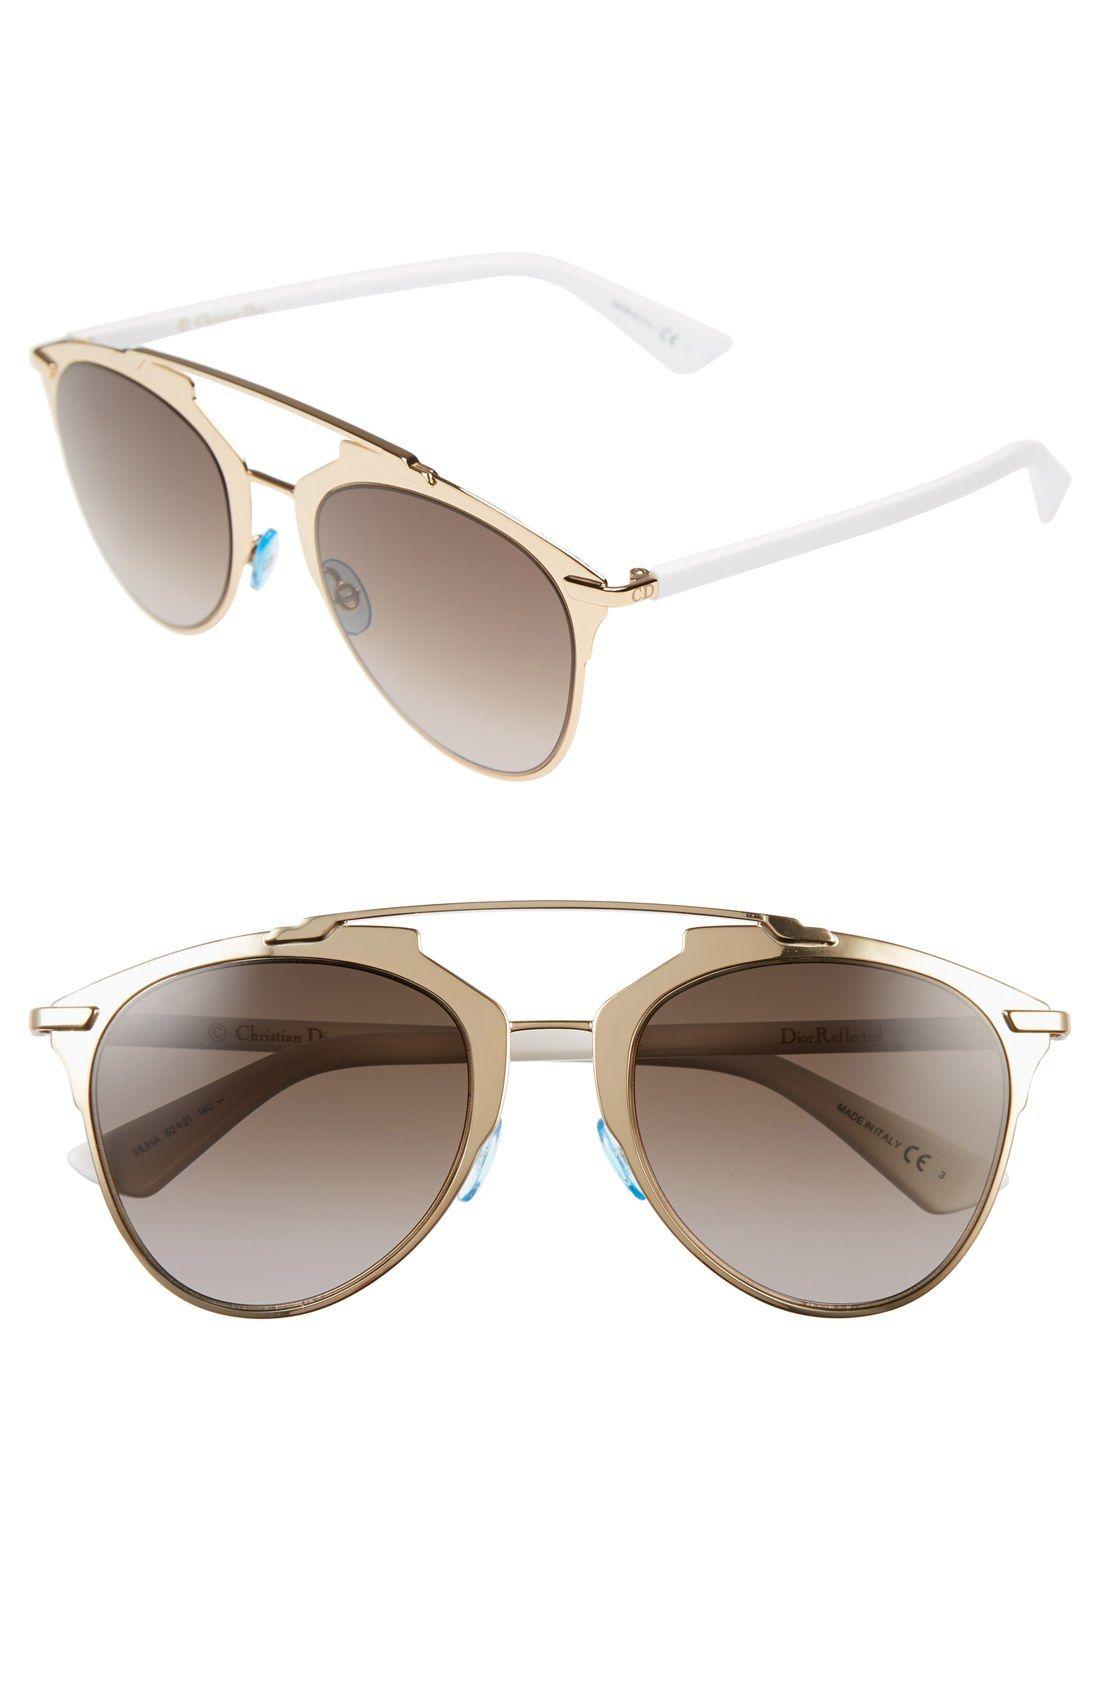 cef0ca3124 Dior  Reflected  52mm Sunglasses